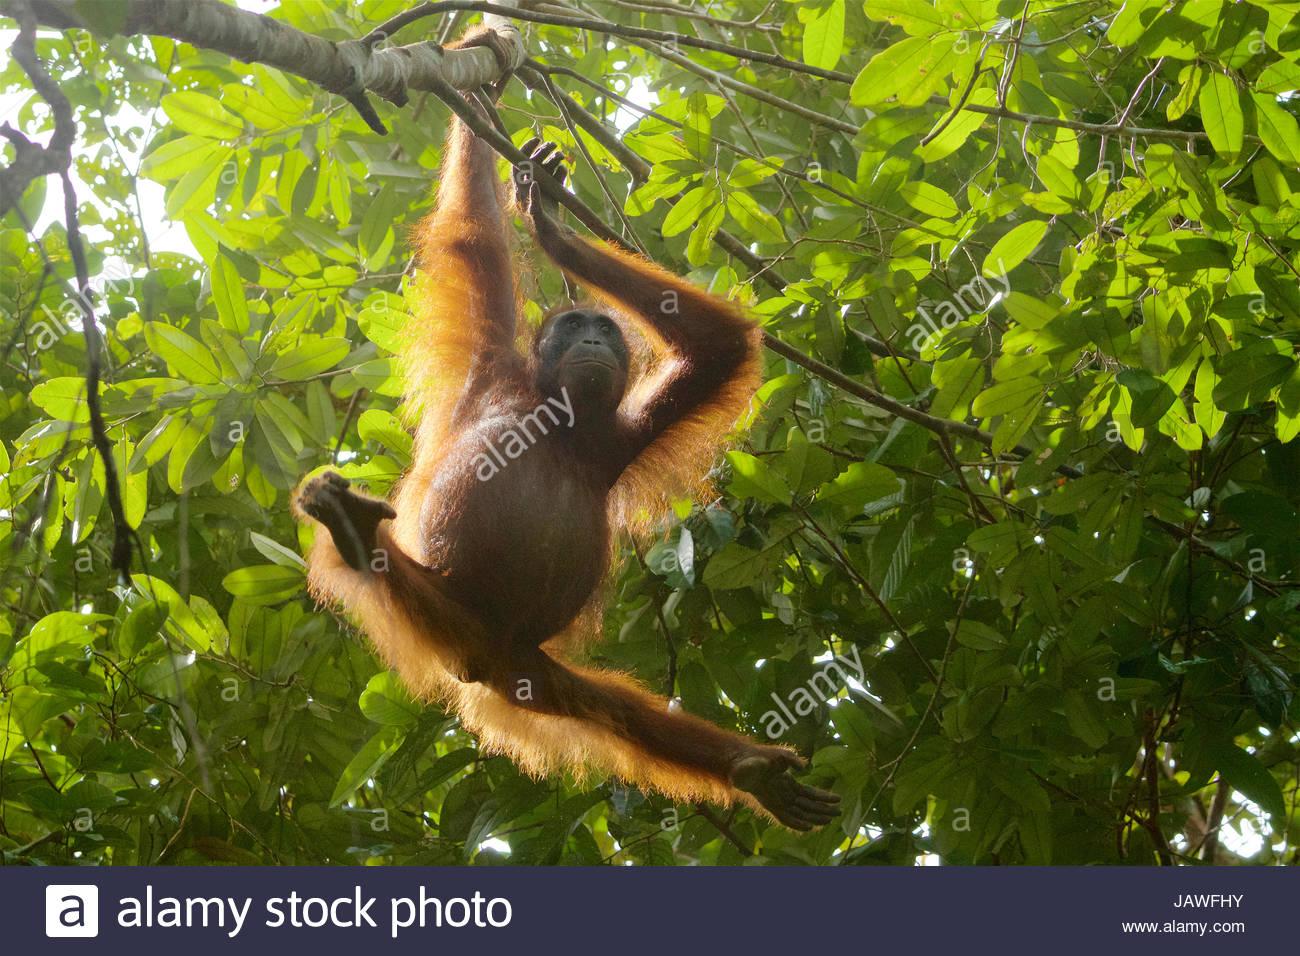 Una femmina adulta orangutan, pongo pygmaeus wurmbii, appeso ad un albero in Gunung Palung National Park. Immagini Stock